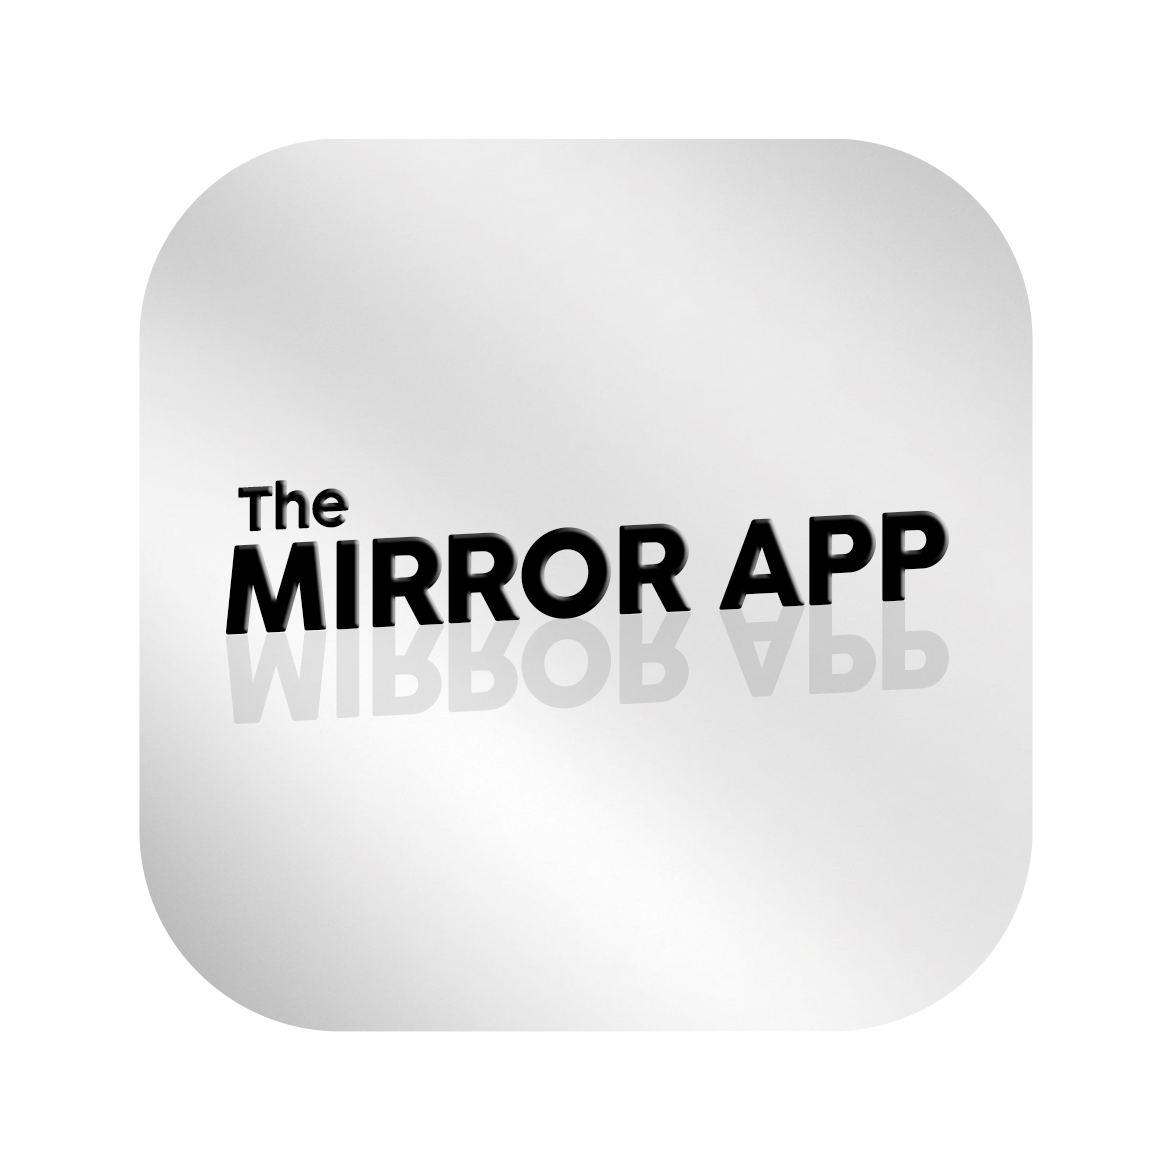 The Mirror App